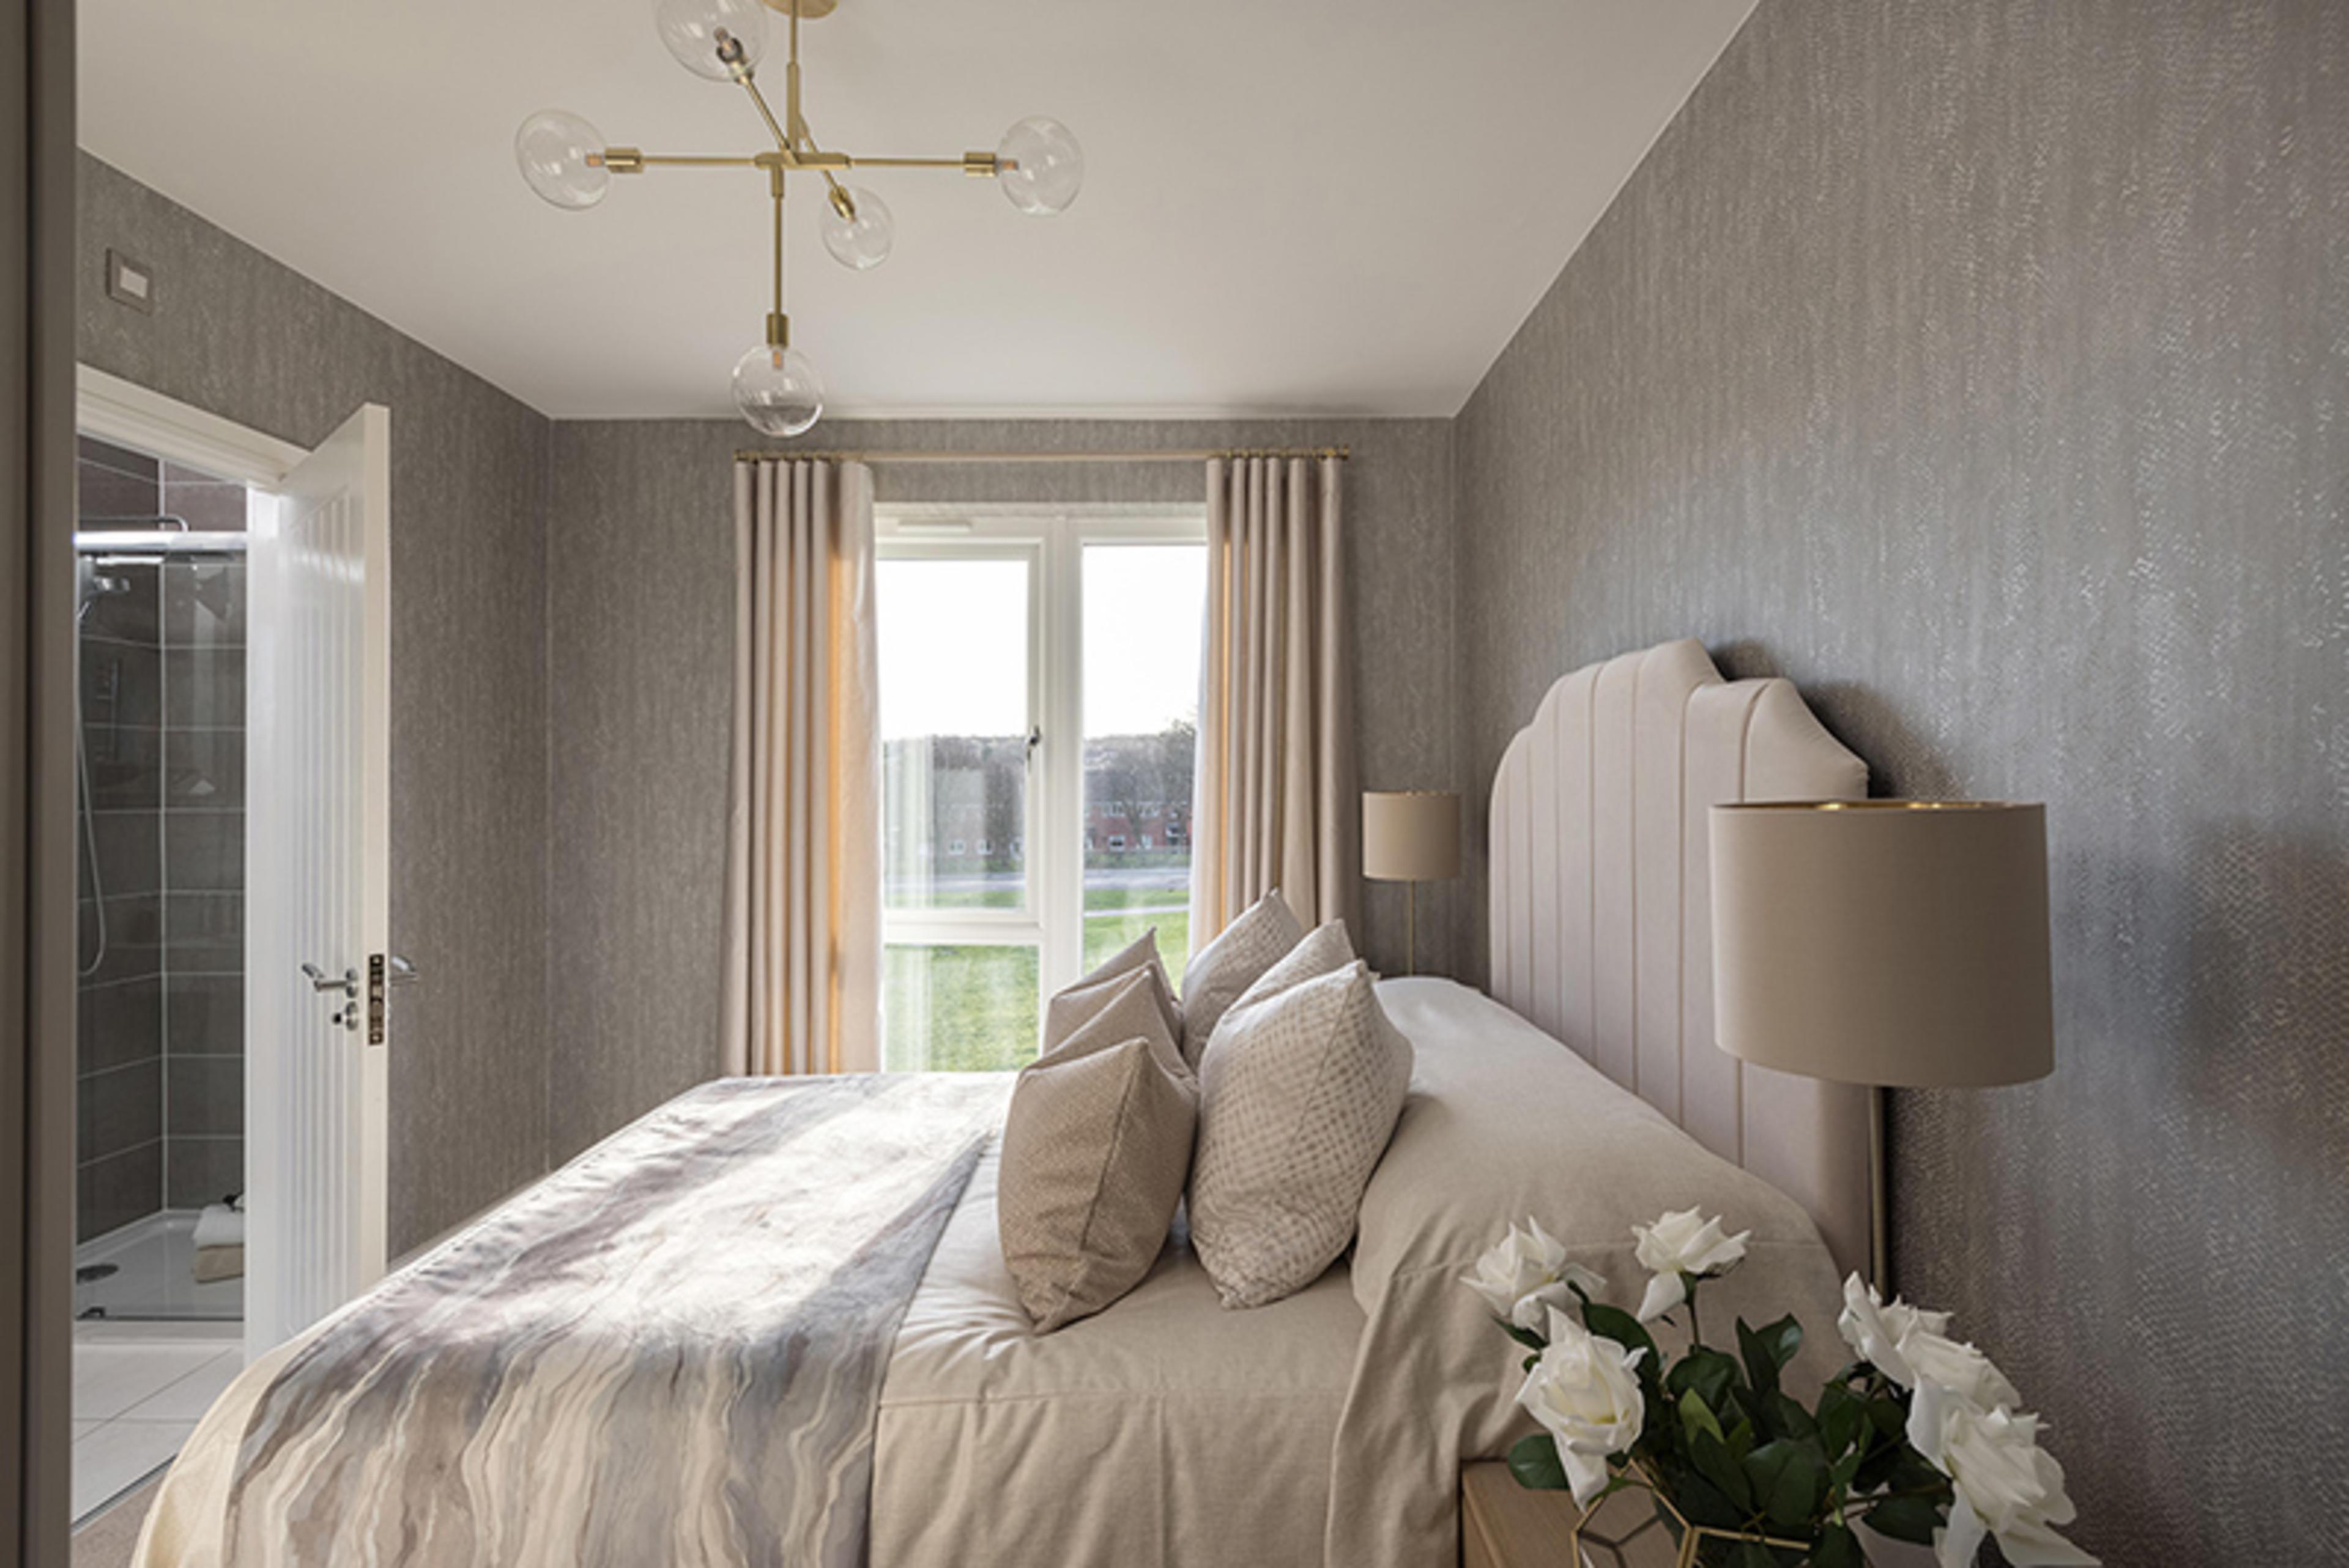 watling-grange-harrogate-merevale-4-bed-home-master-bedroom-1